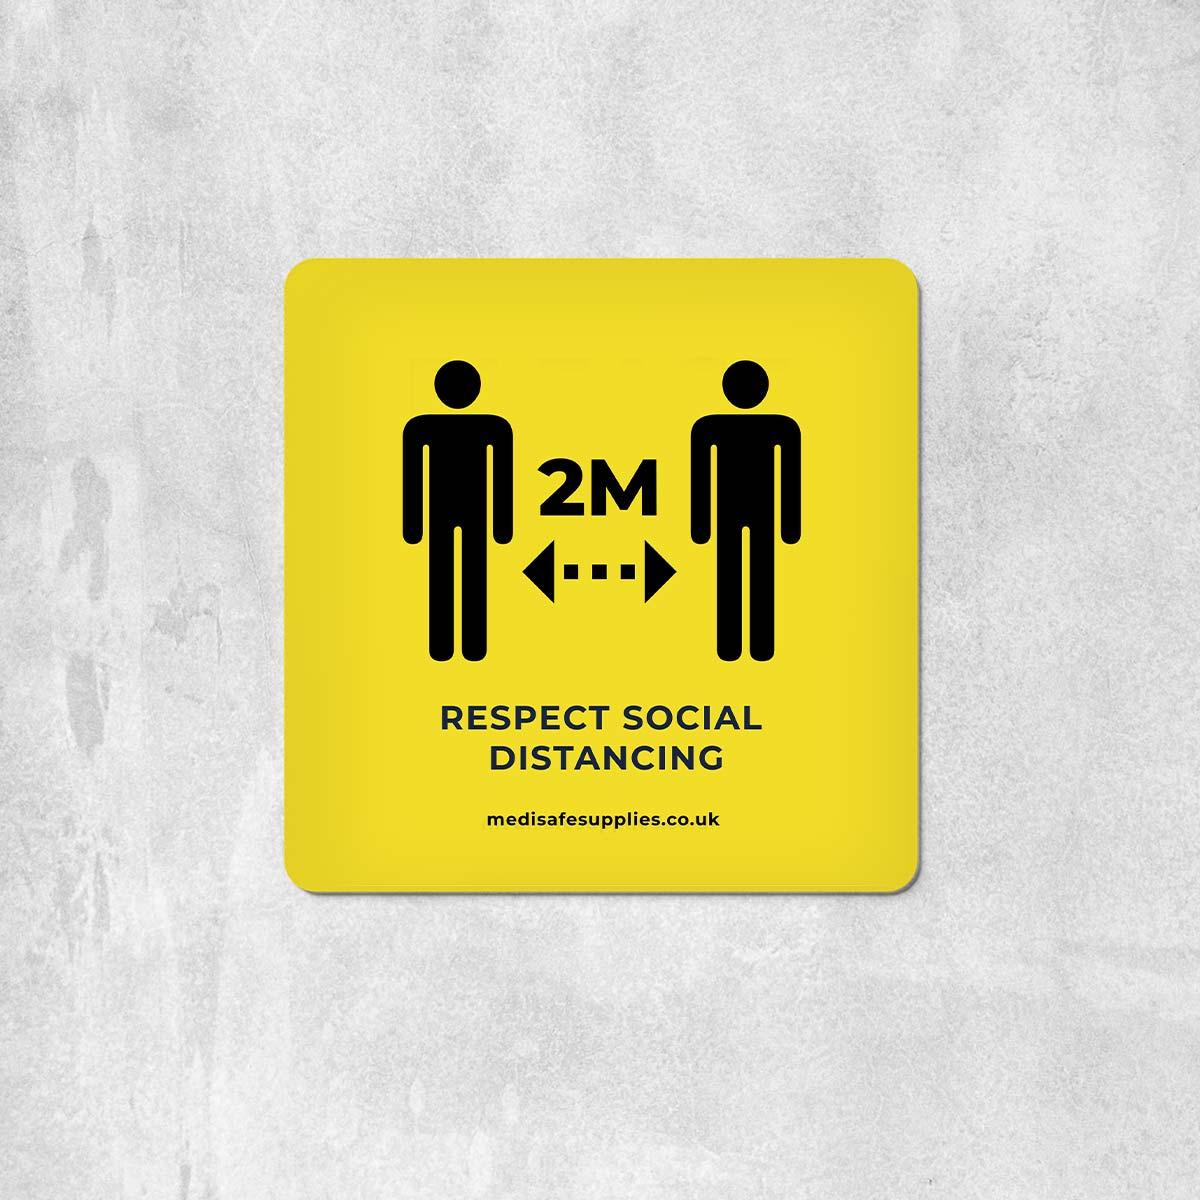 2m Floor Stickers (Please Keep 2M Apart) Social Distancing